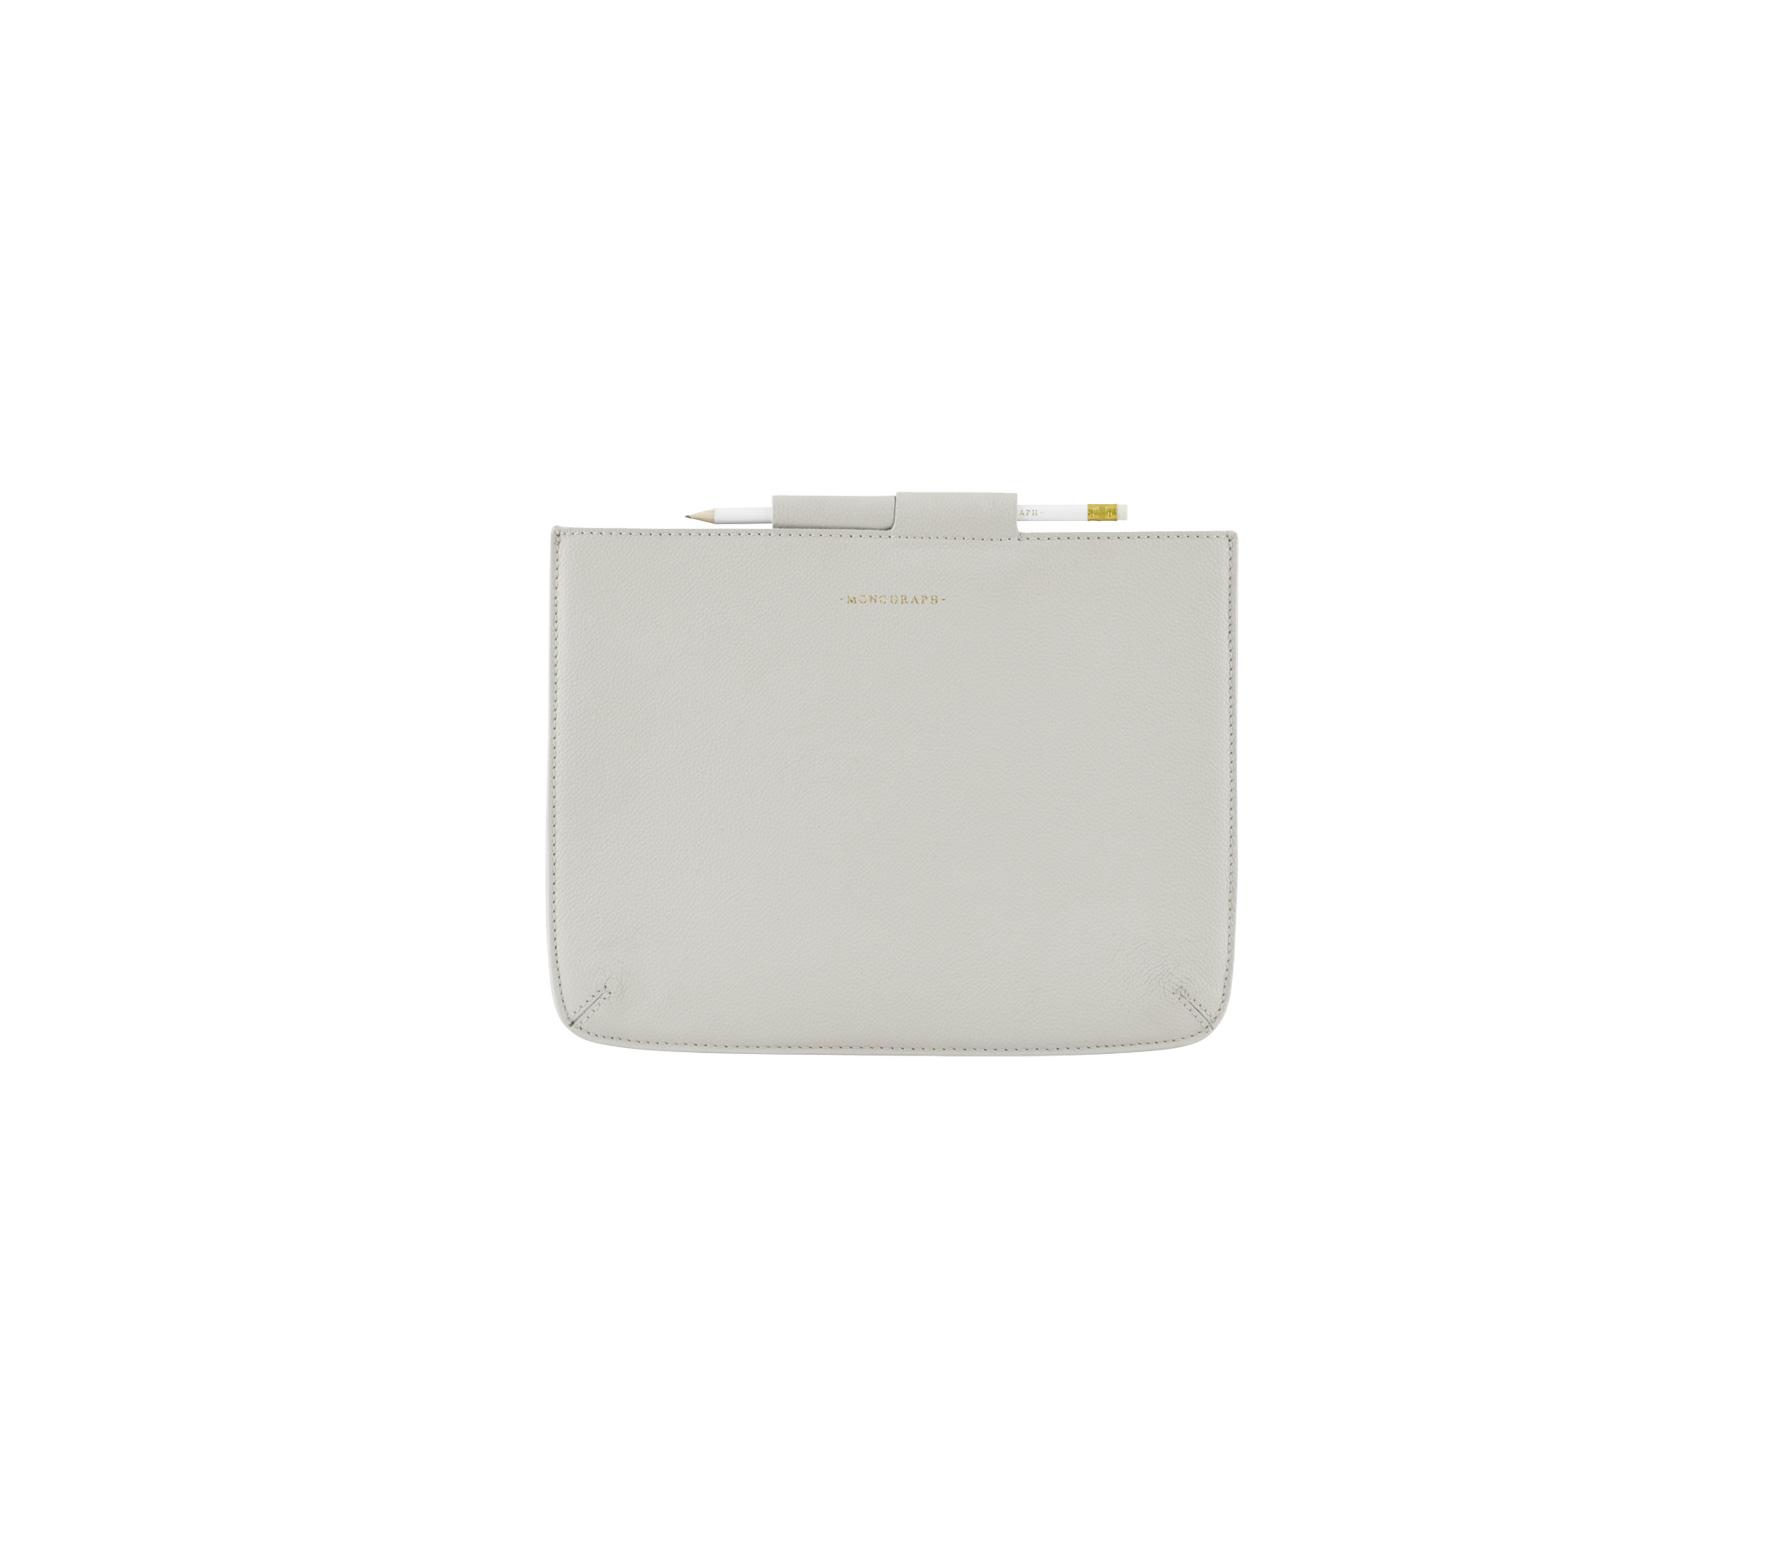 Housedoctor Cover iPad hoes leer grijs Mini 24 x 17 cm